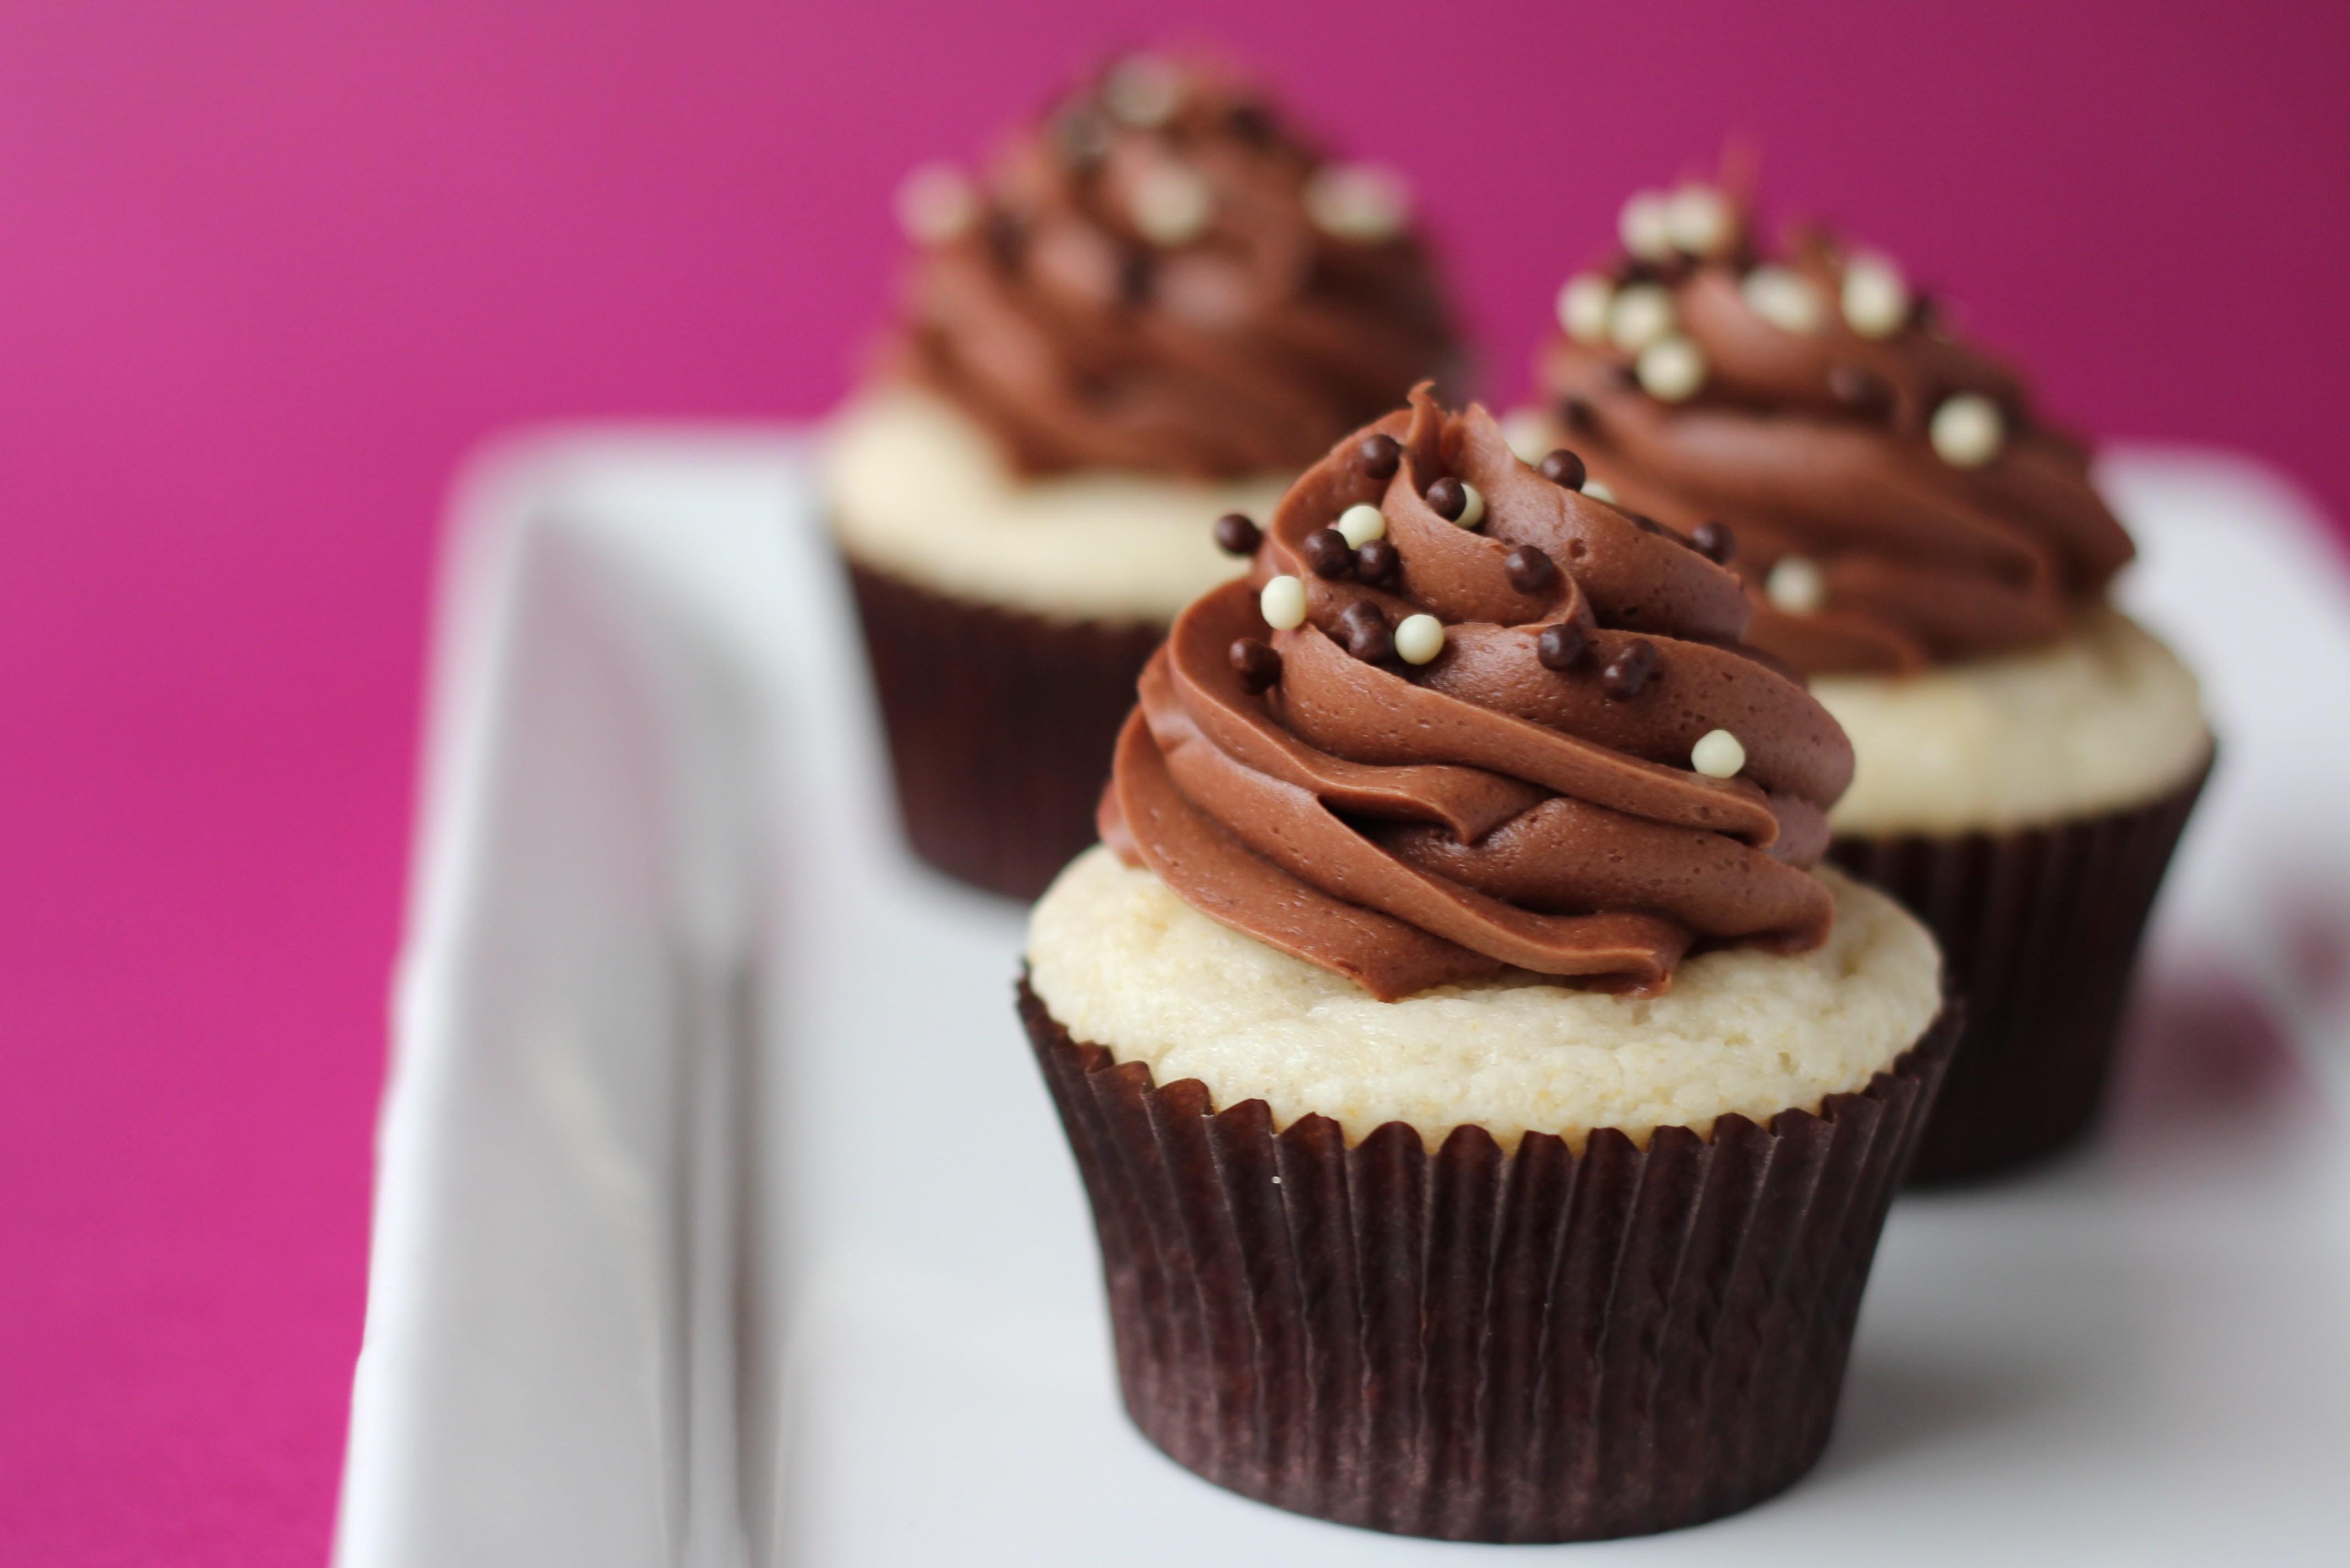 Classic Chocolate Vanilla Cupcakes